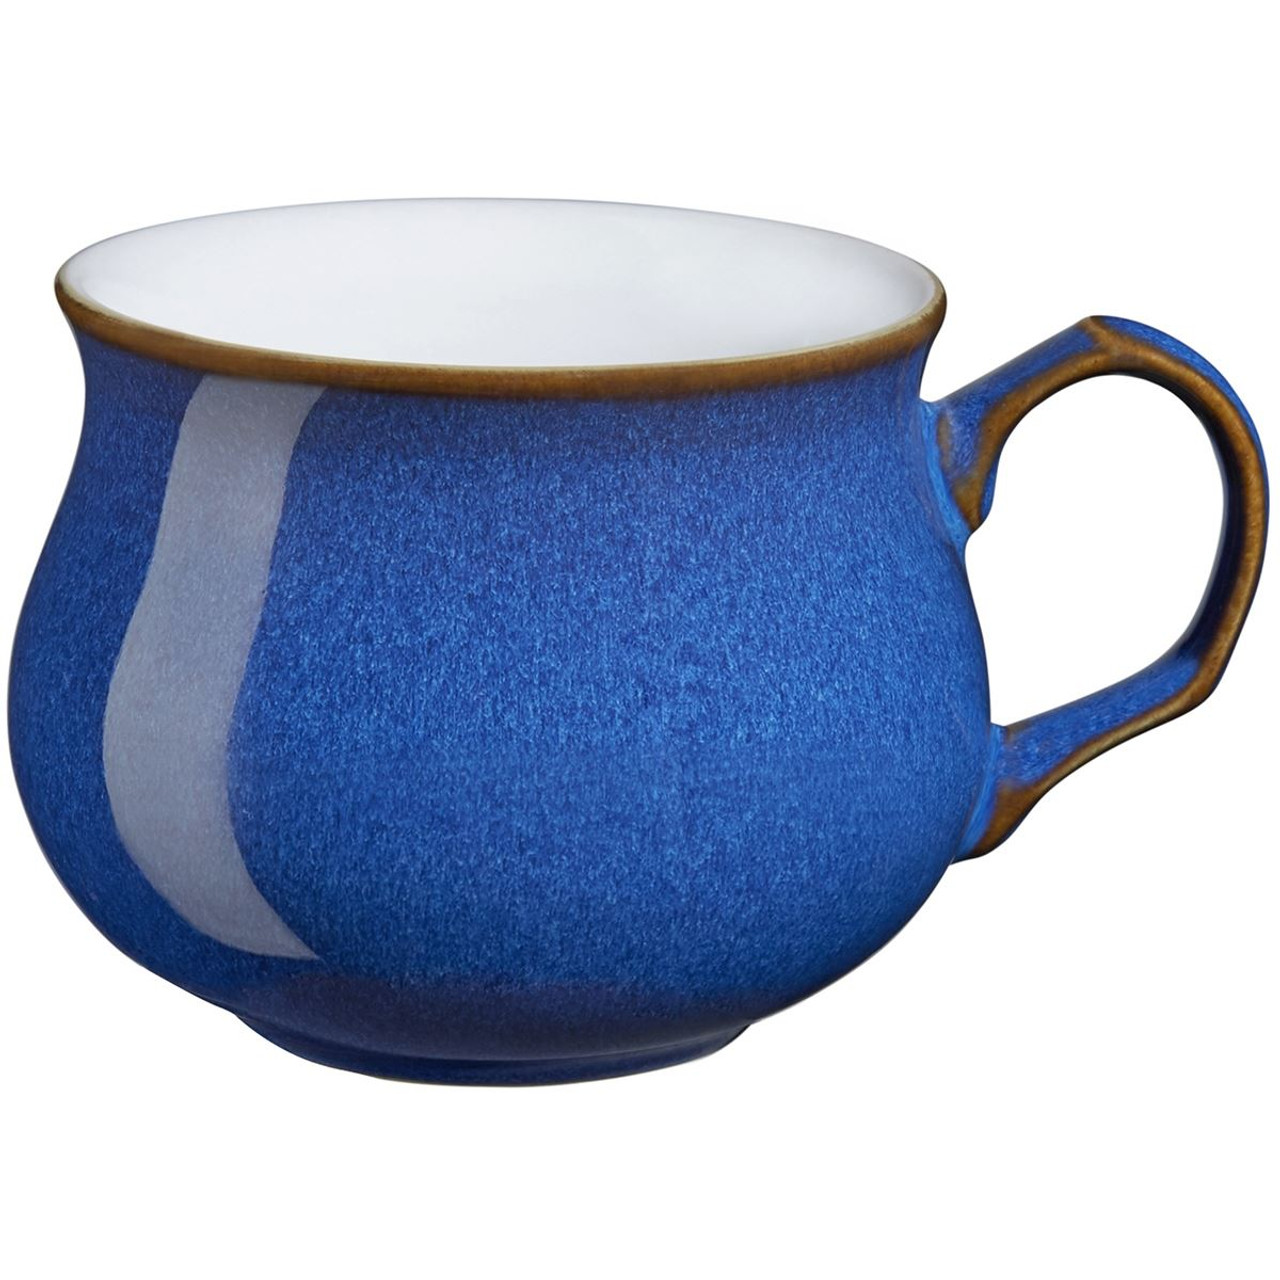 Denby Imperial Blue Tea Cup